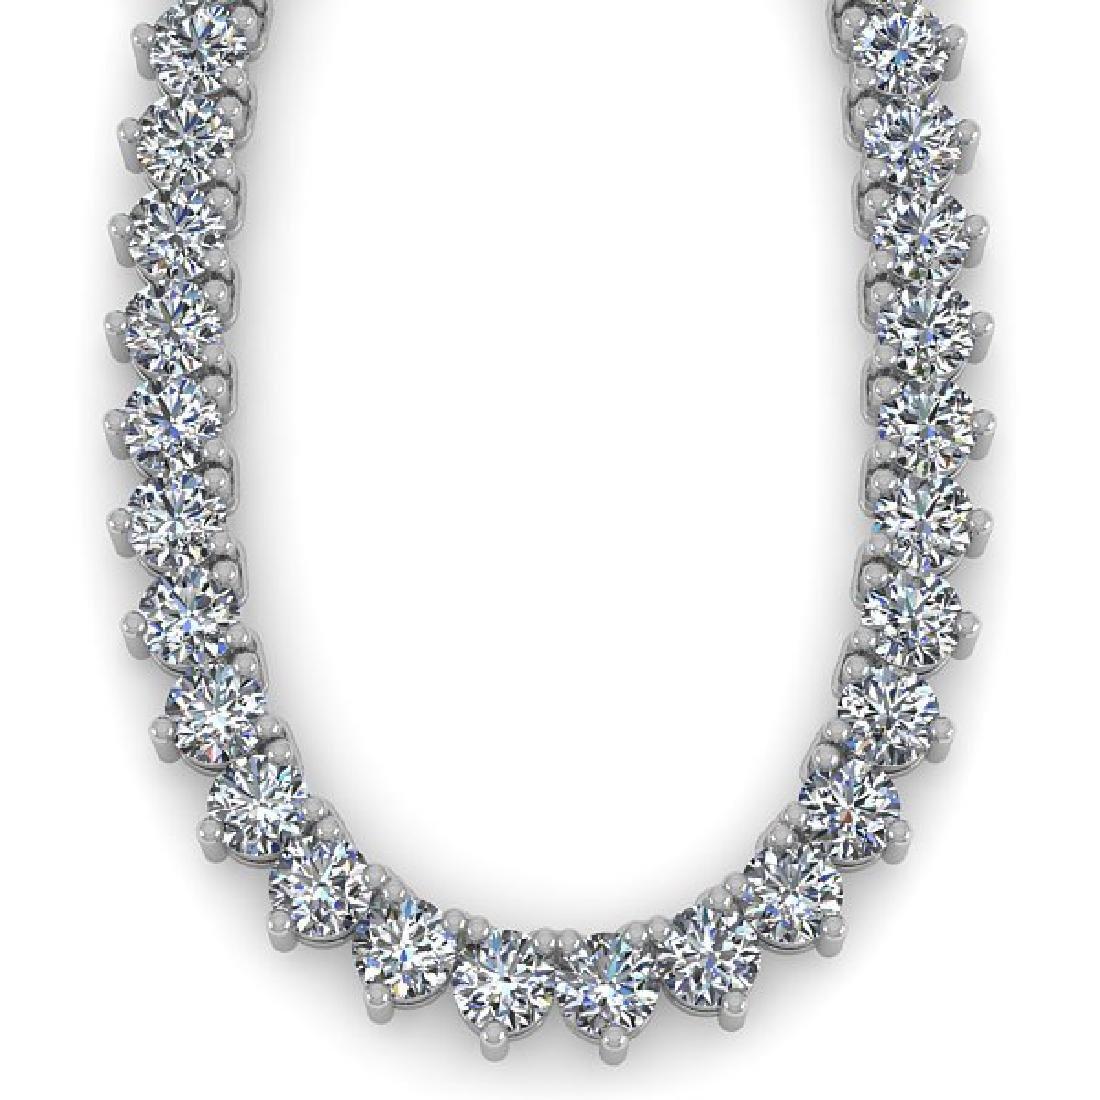 48 CTW Solitaire SI Diamond Necklace 14K White Gold - 2